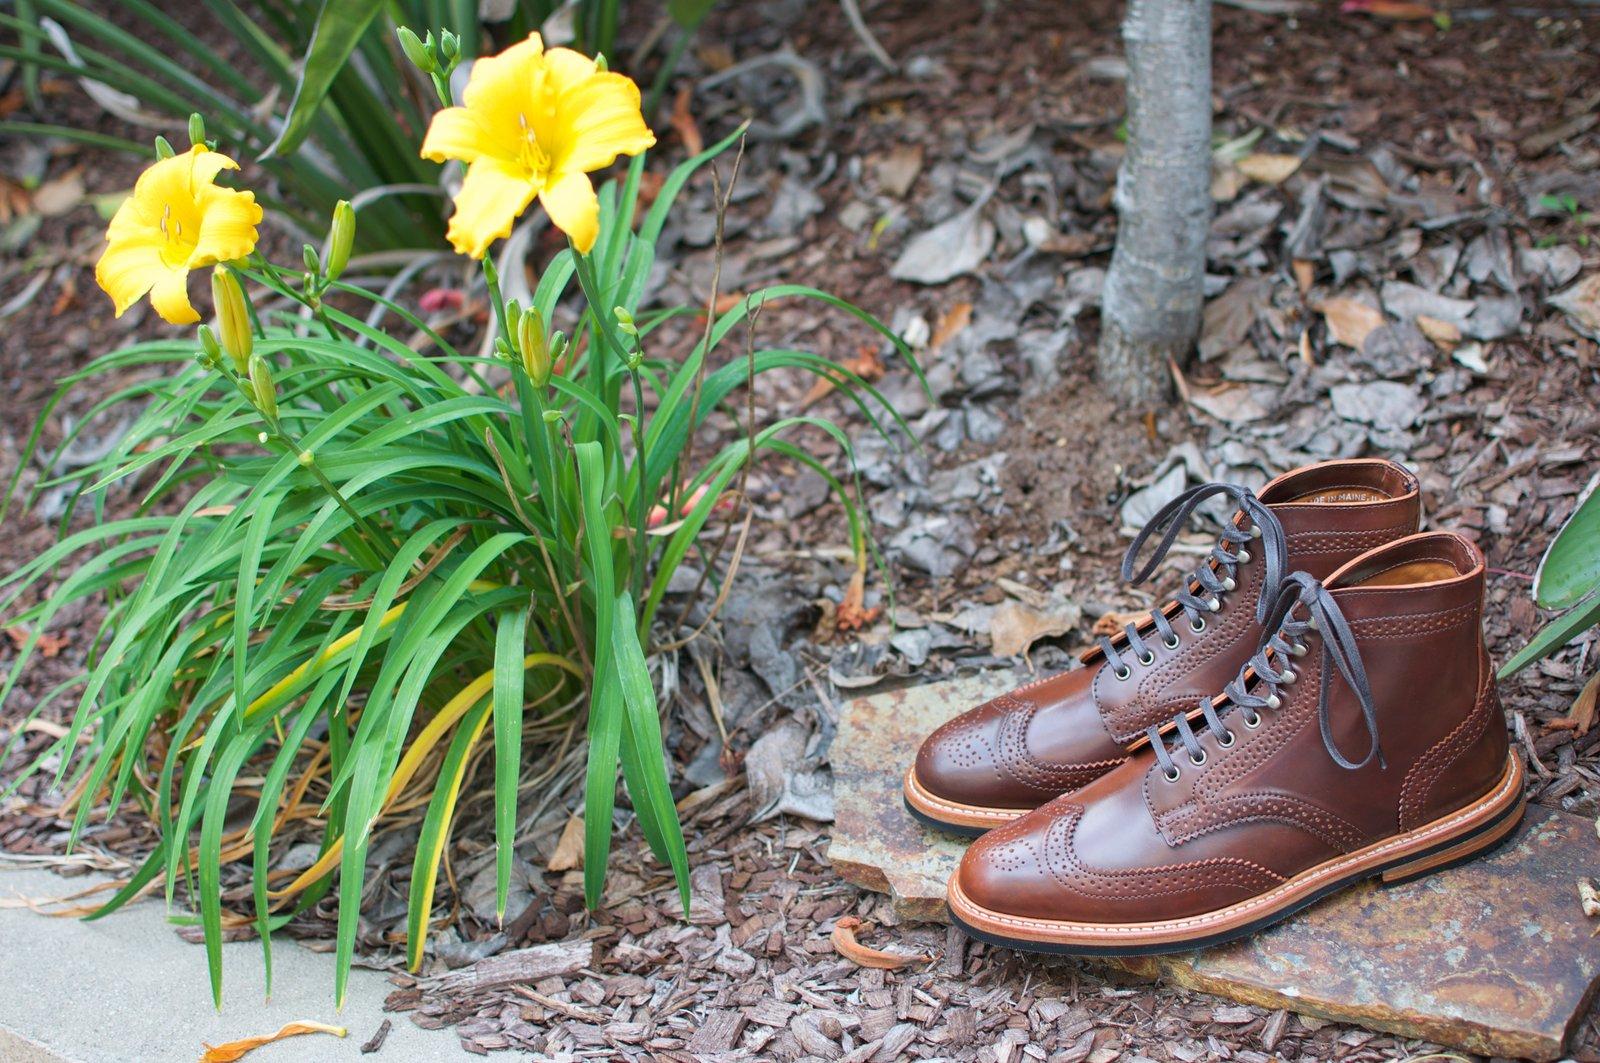 Rancourt Color #4 Shell Cordovan WT Boots - 2020-05-16 - 2.jpg